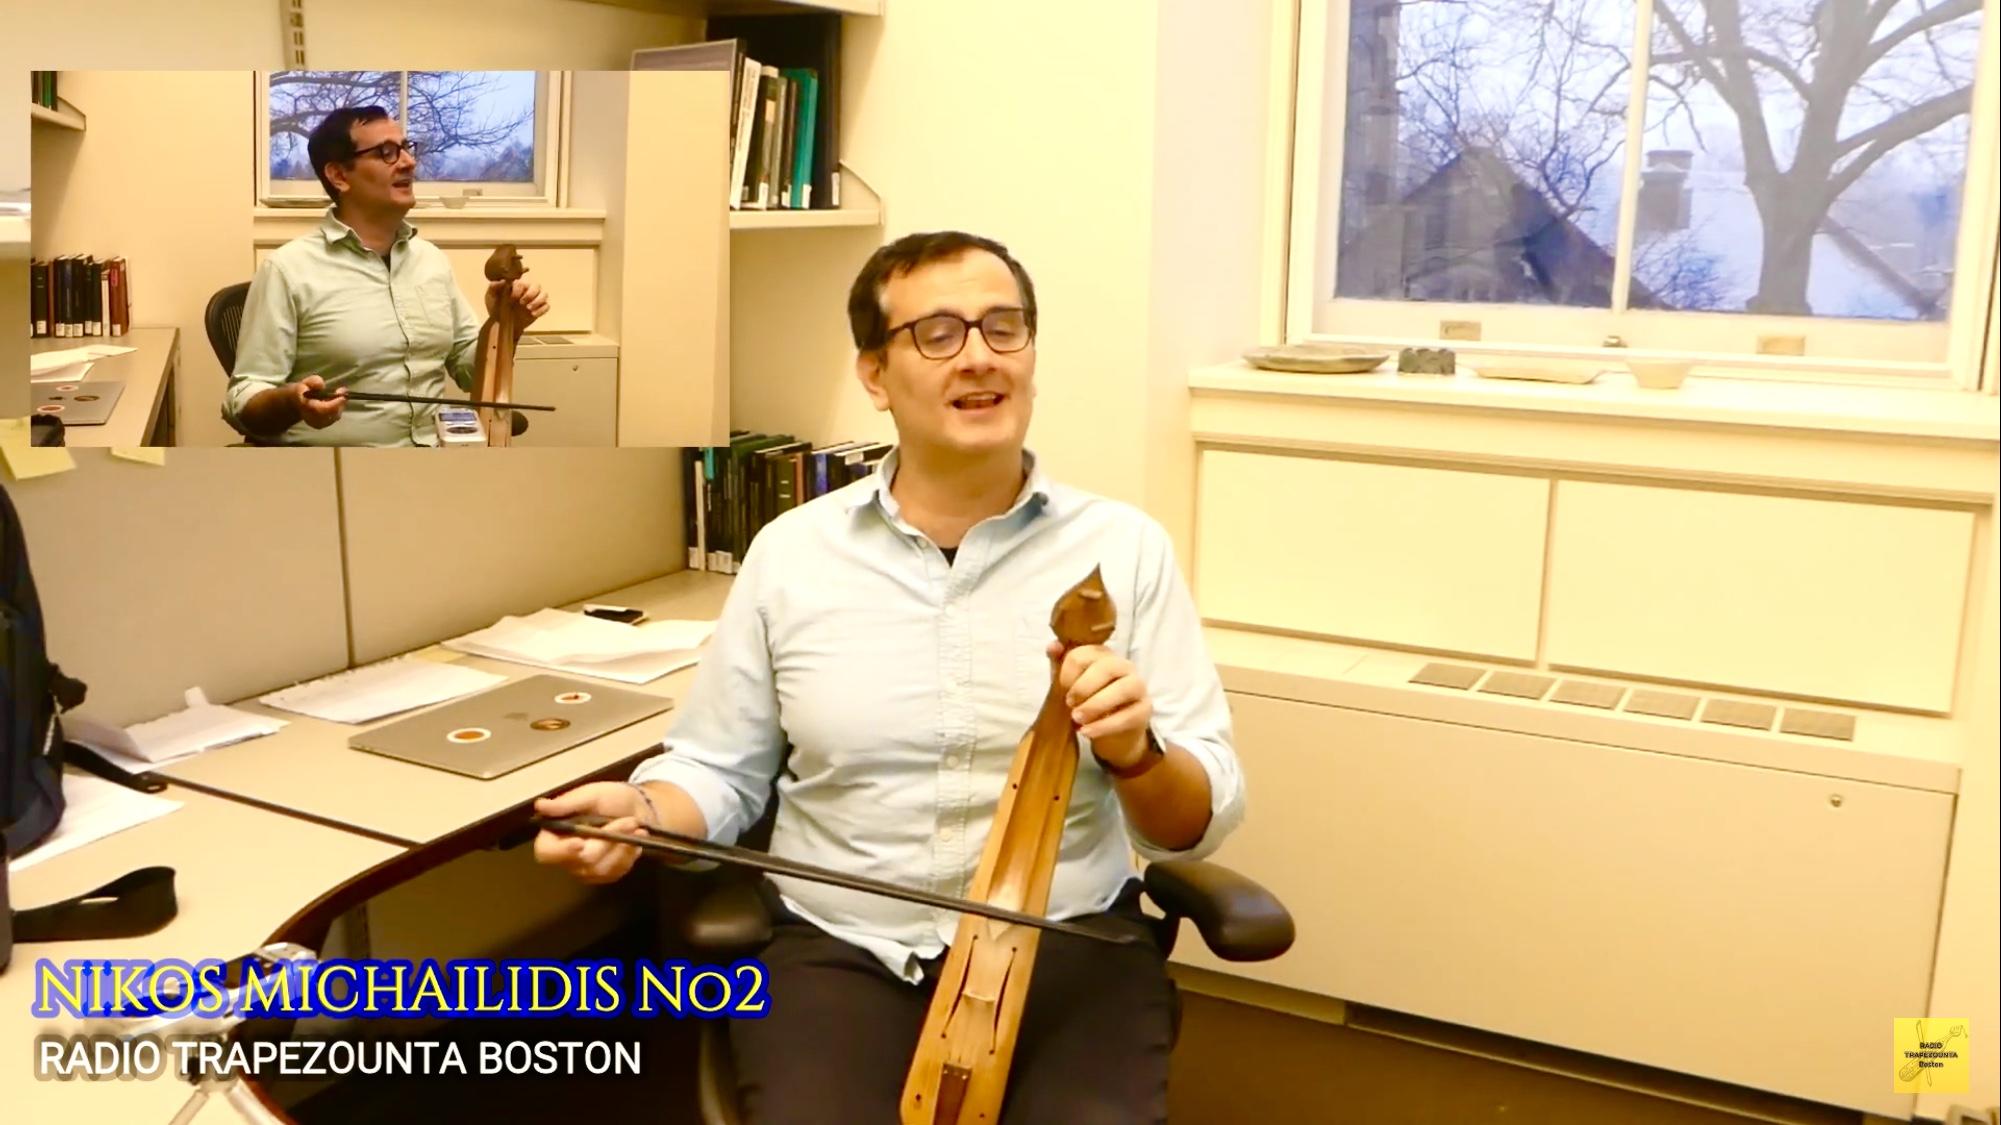 Nikos Michailidis || Νίκος Μιχαηλίδης || March 2019 No2